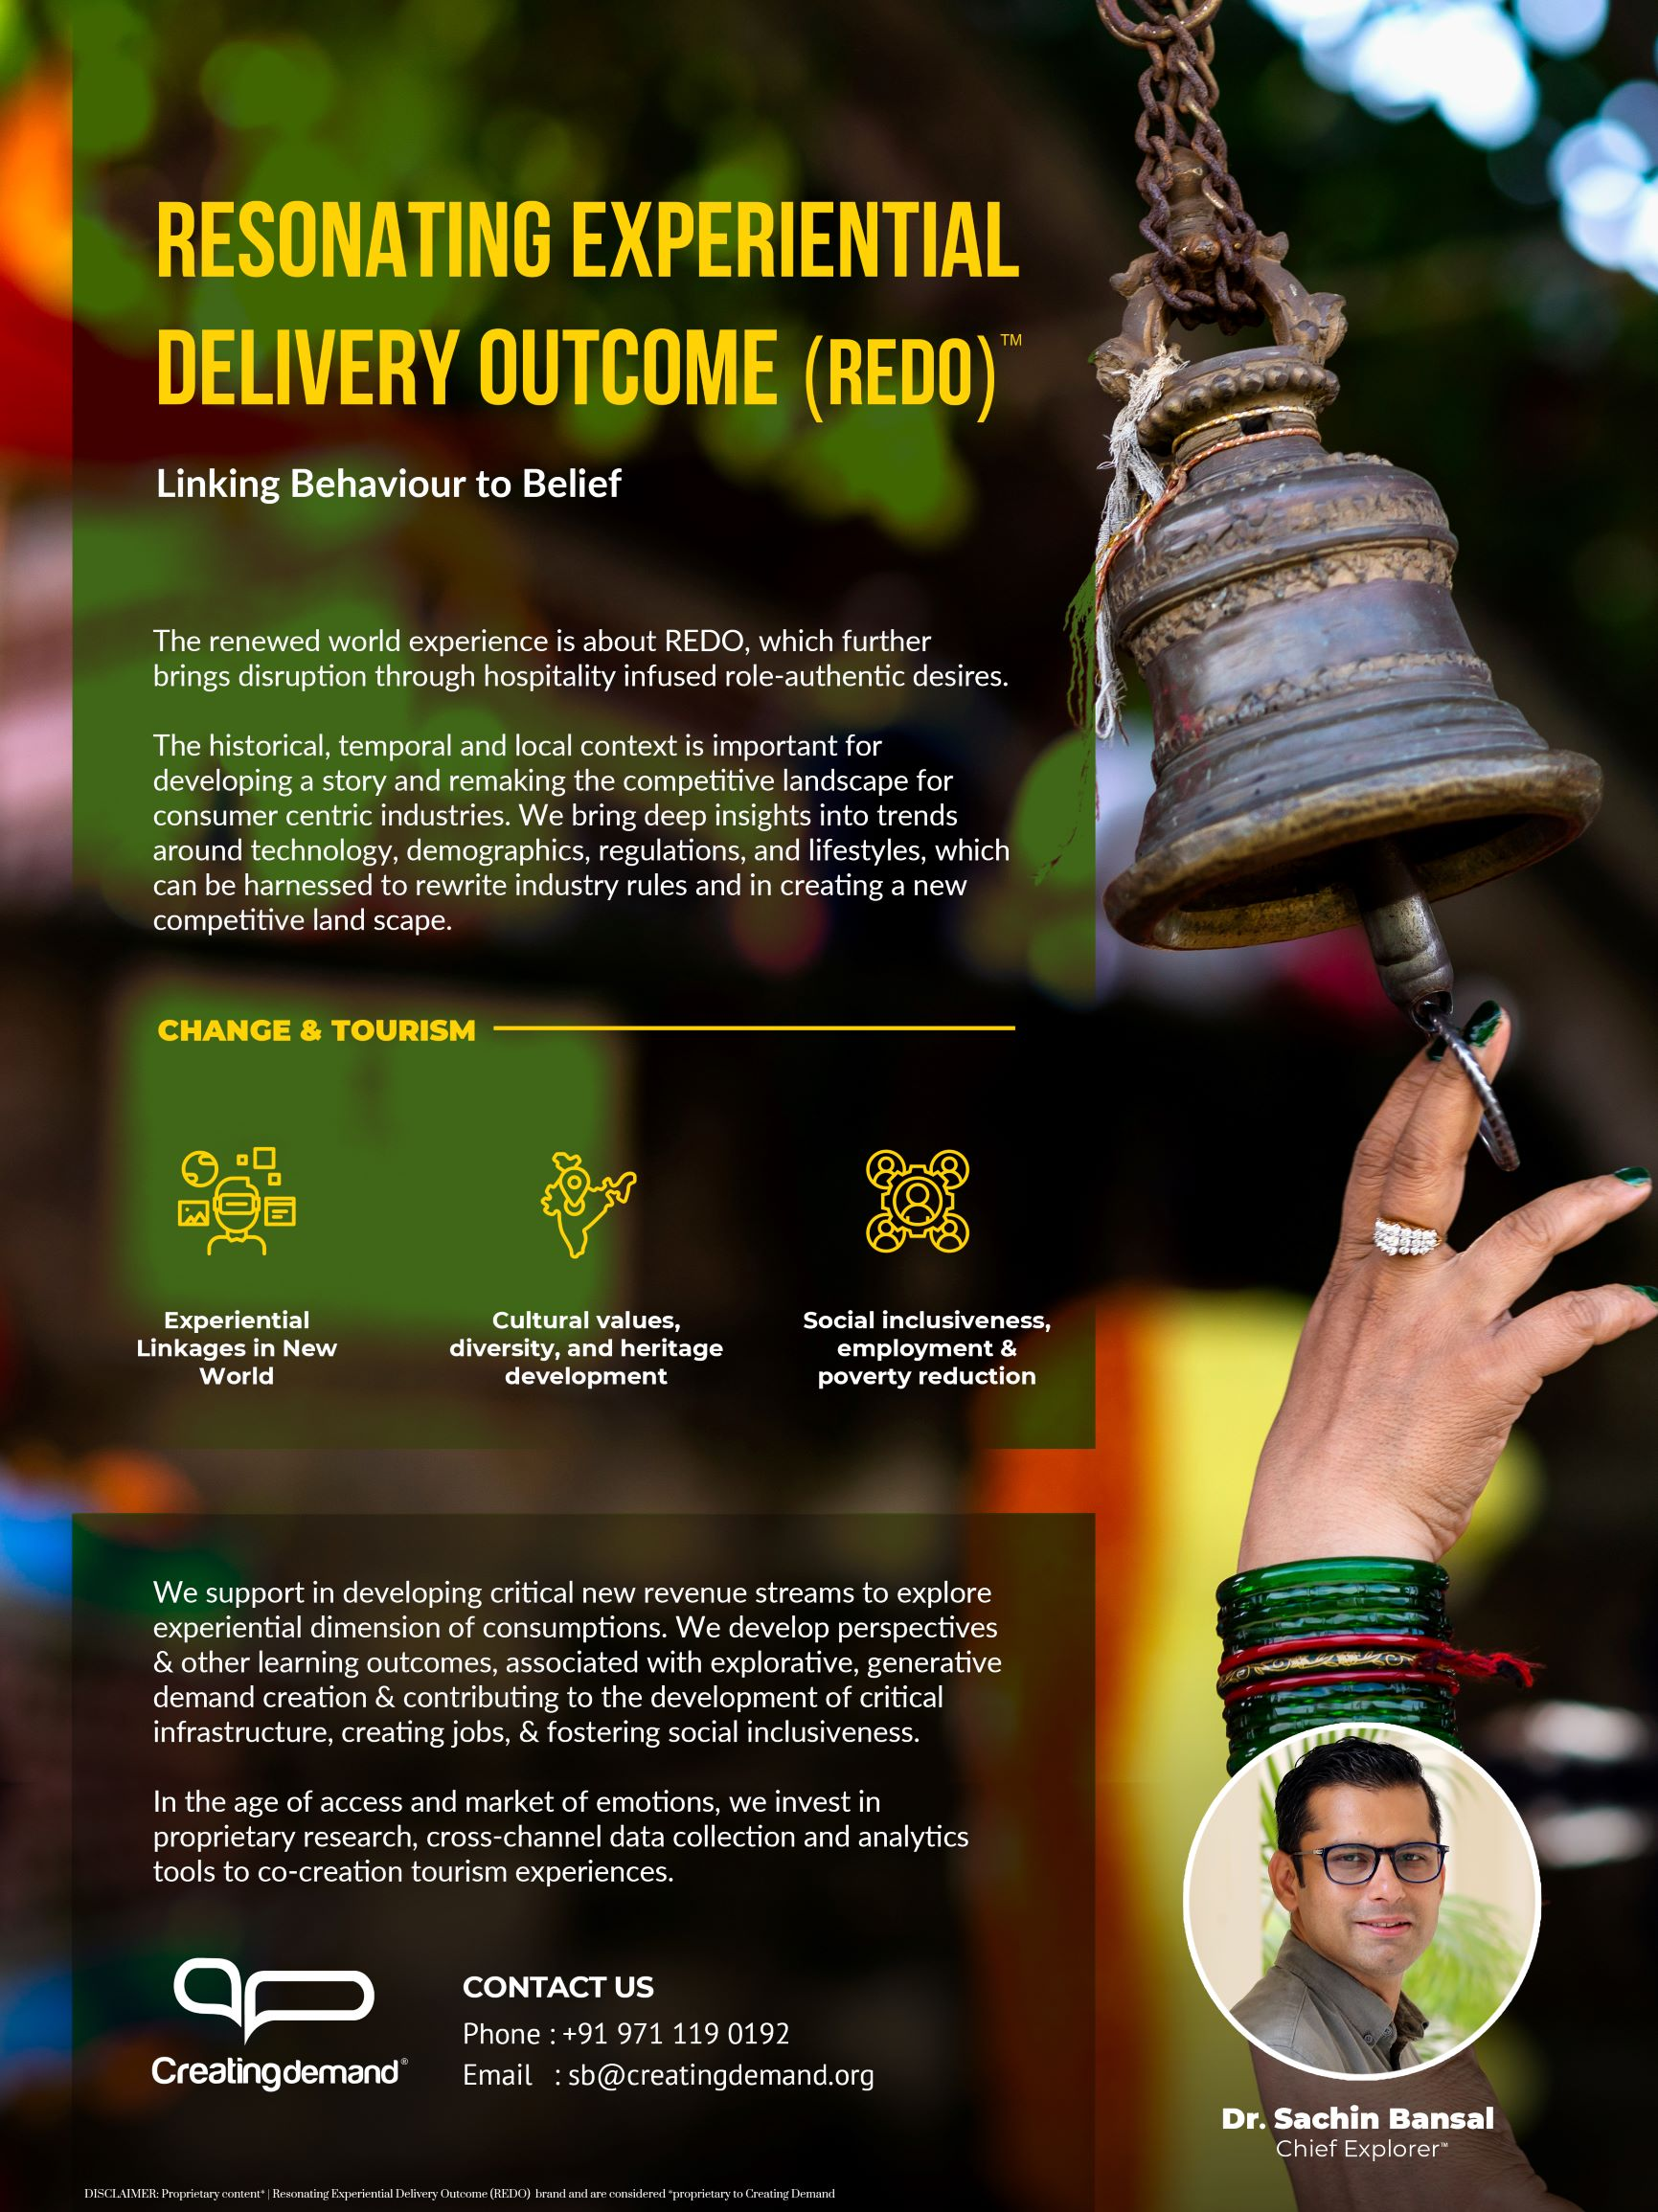 REDO by Sachin Bansal